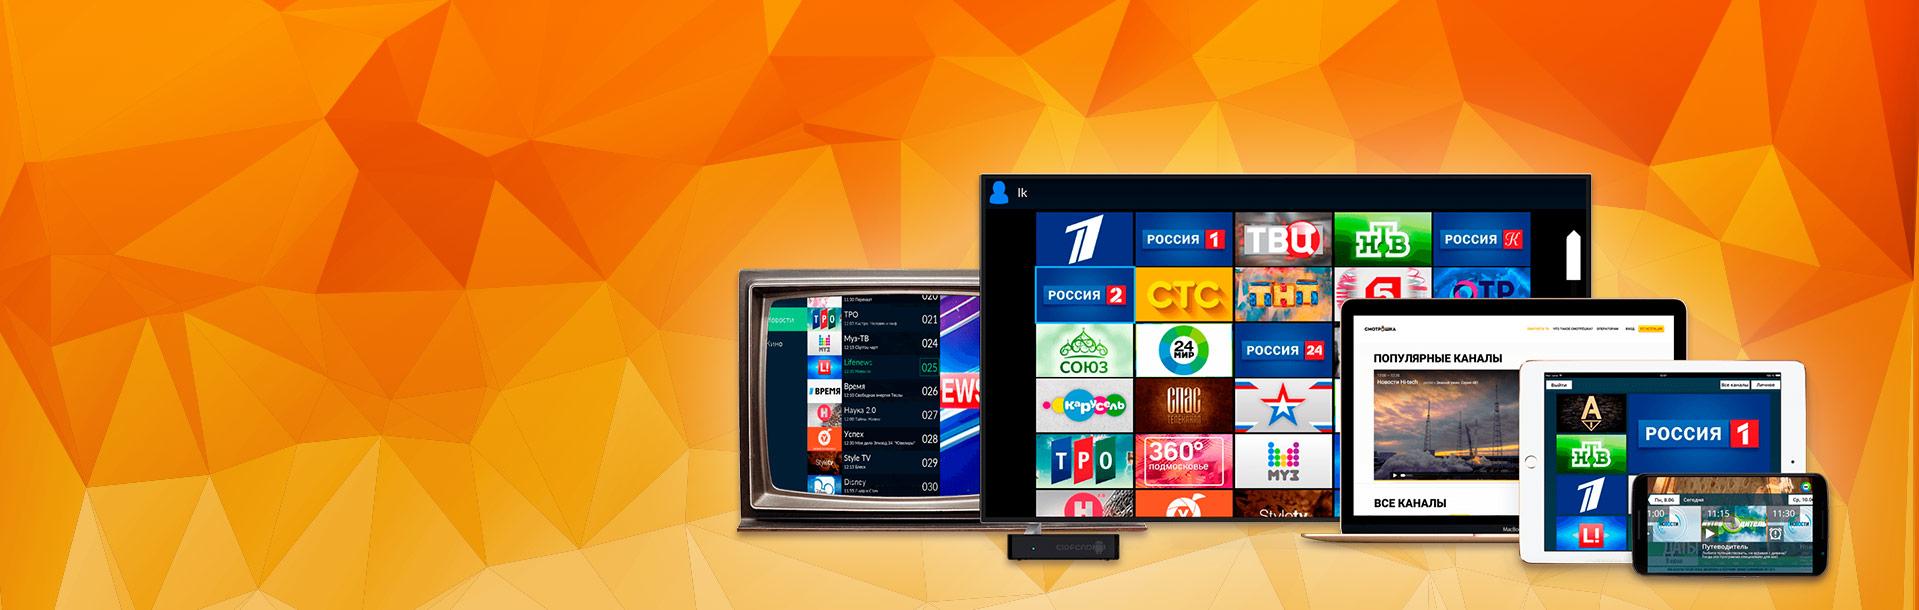 Maxtelecom — провайдер интернета.